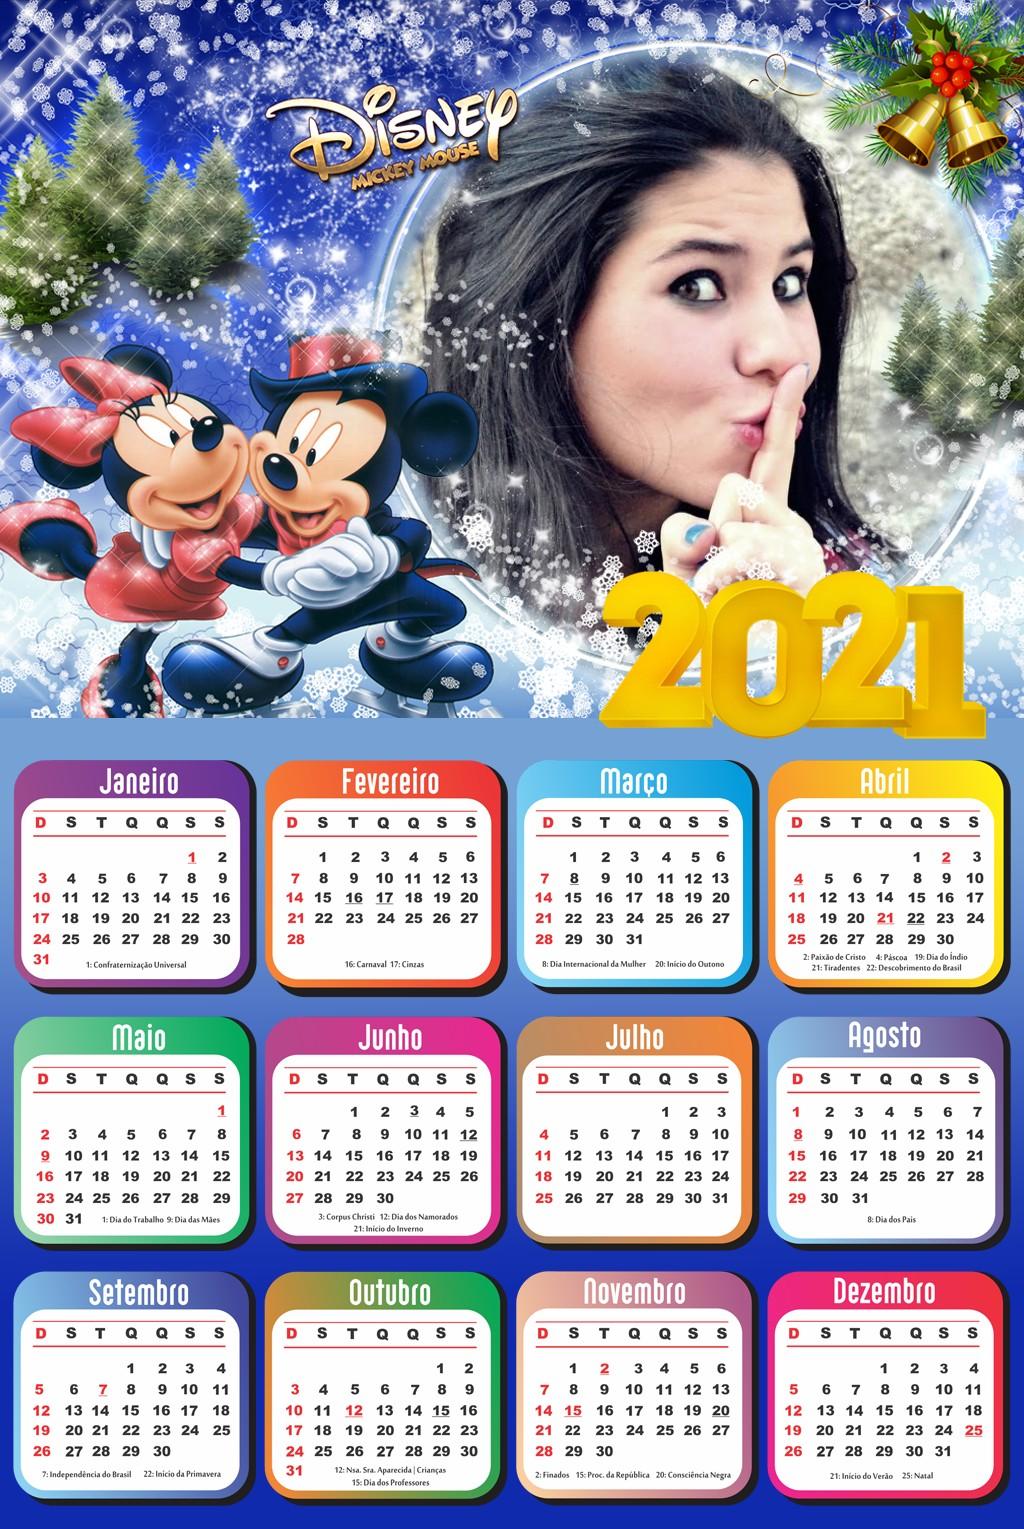 2021-moldura-mickey-e-minnie-mouse-no-natal